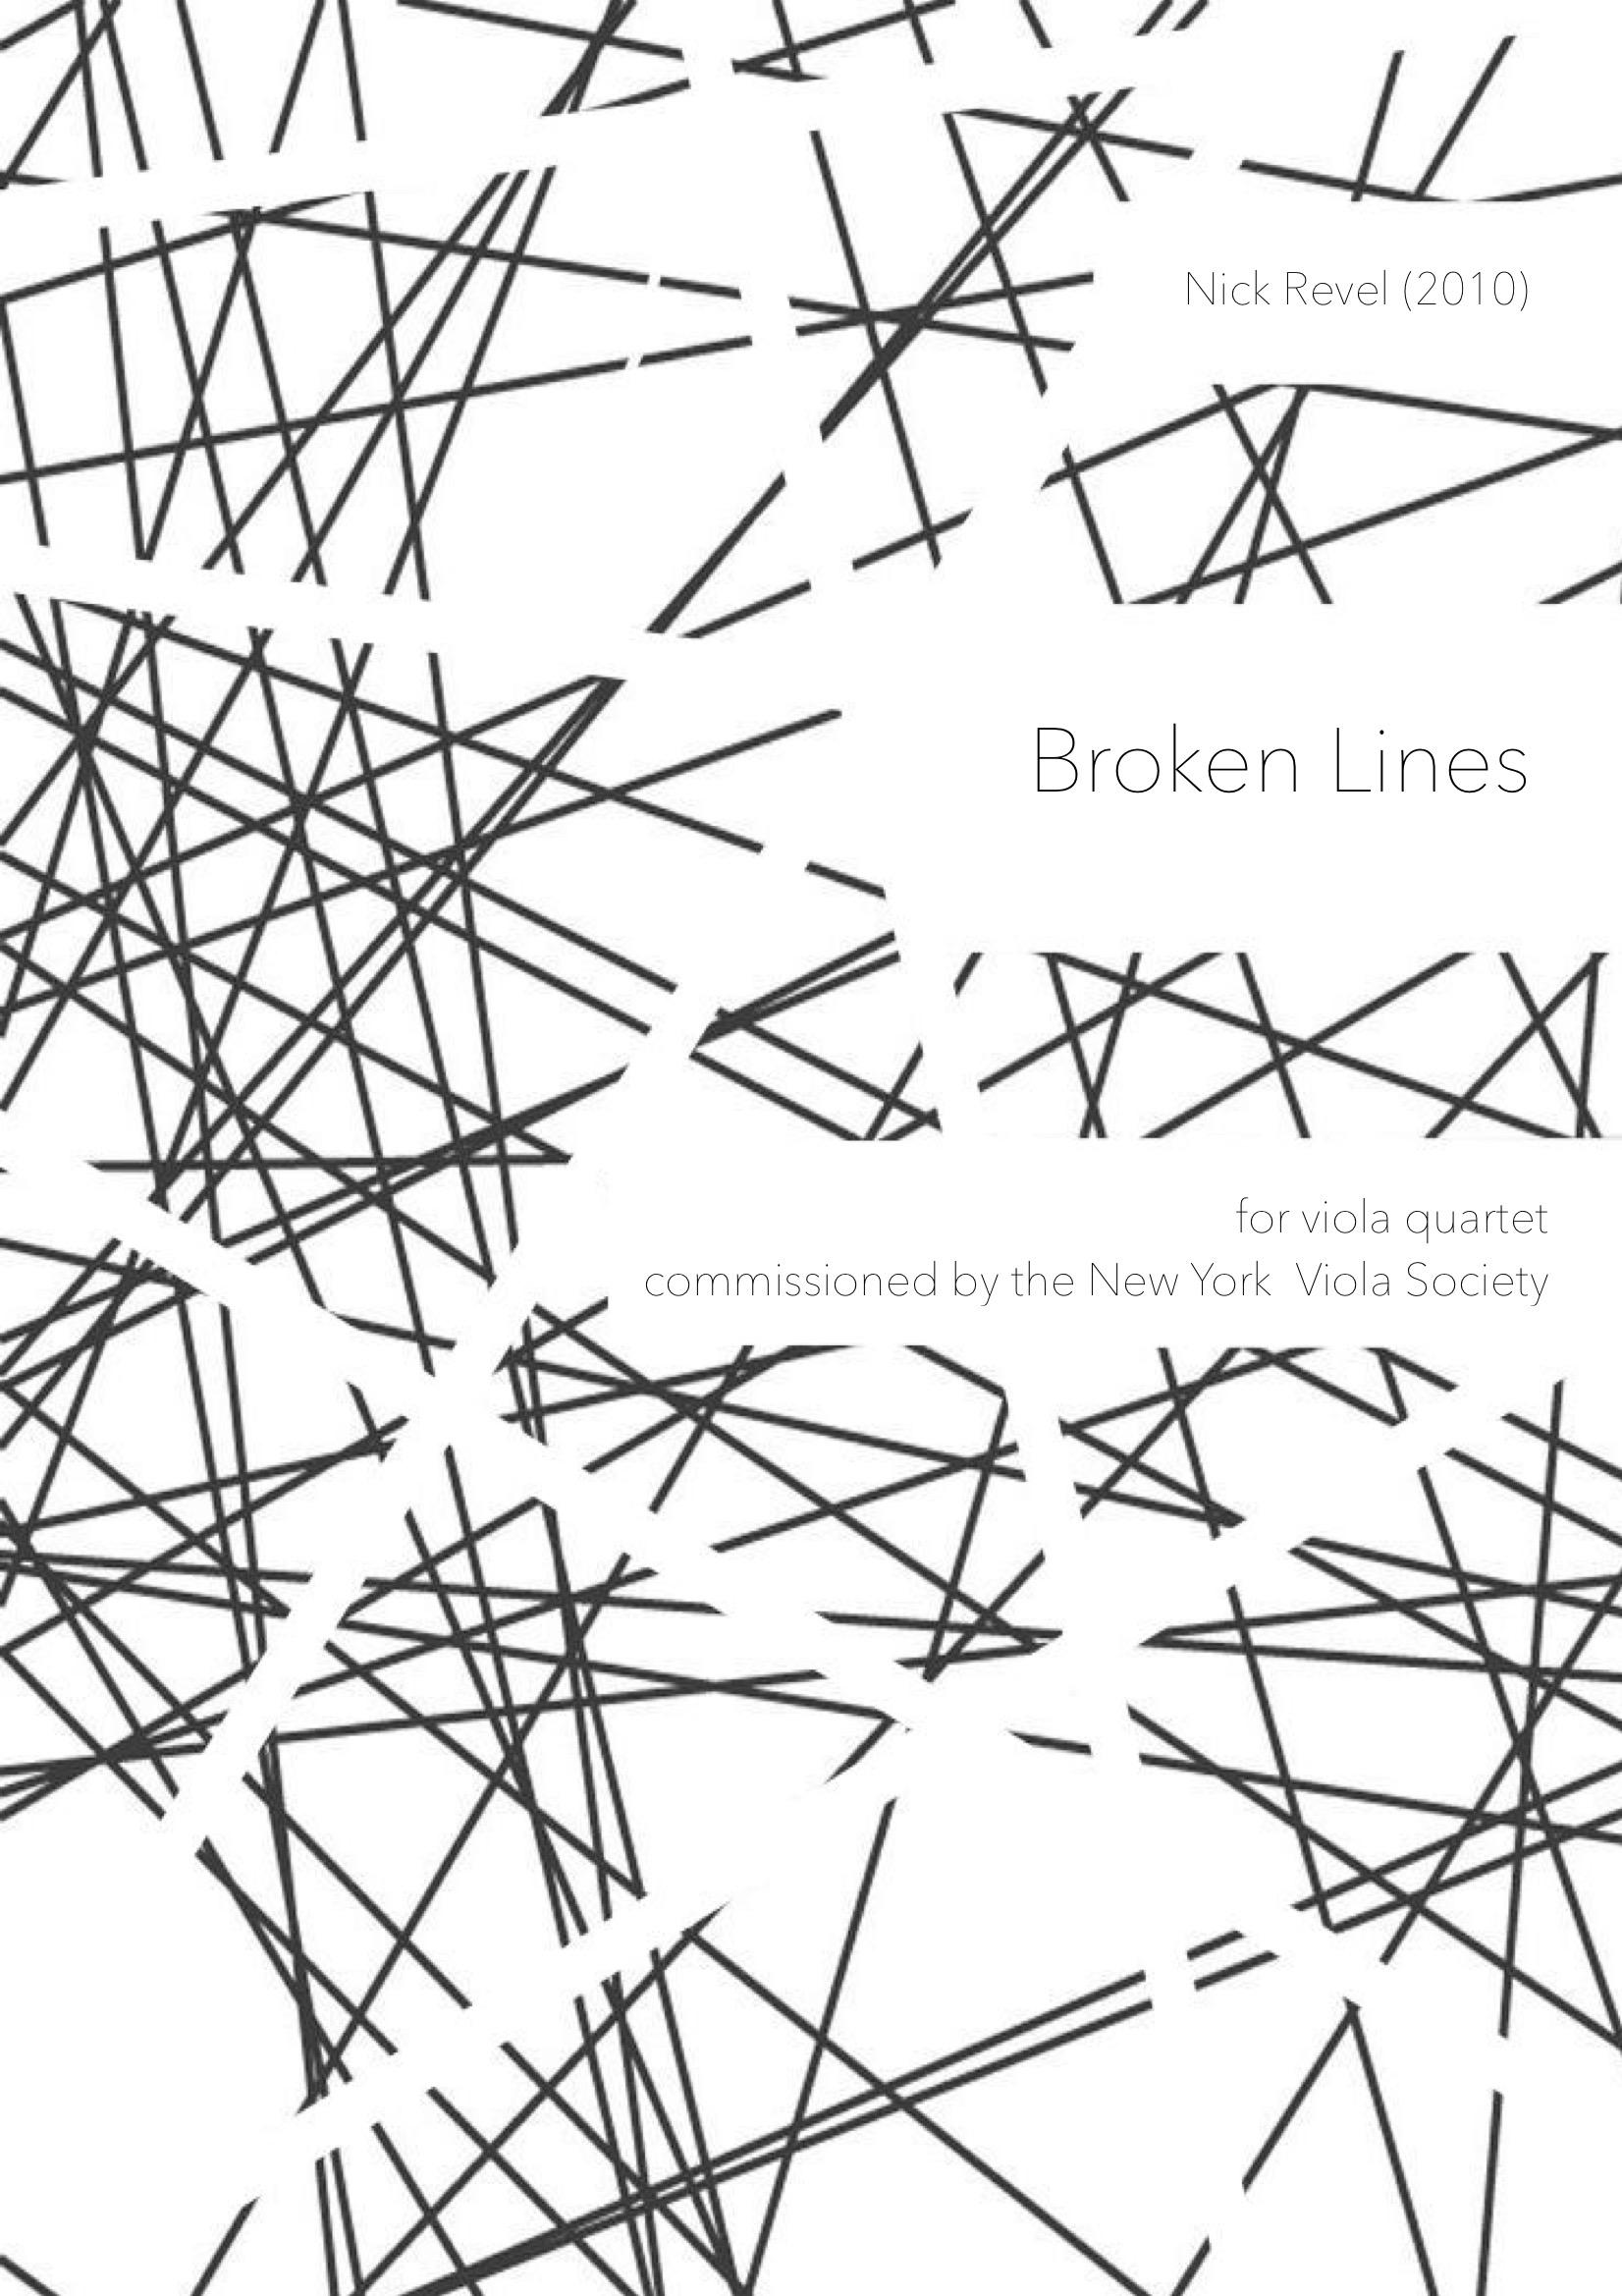 Broken Lines - Viola Quartet Score, 9.25.17 1.jpeg